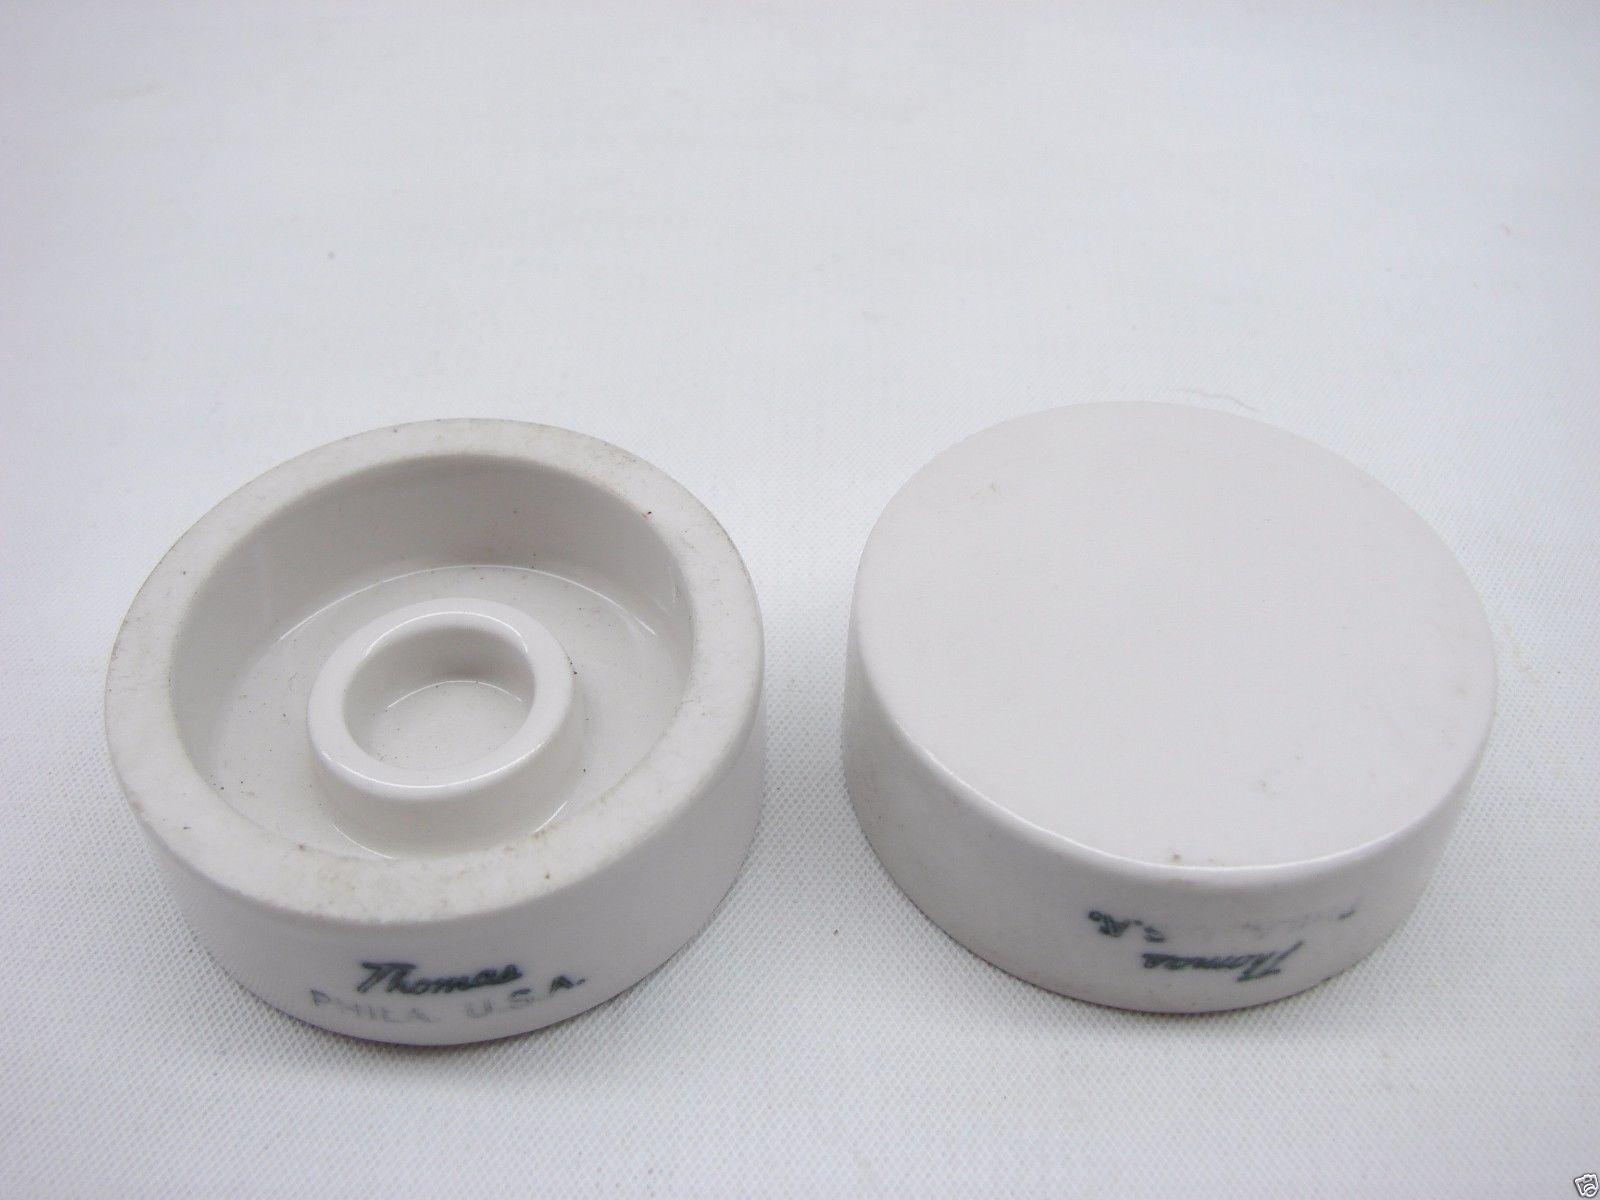 Lot Of 8 Thomas Ceramic Diffusion Dish 15mm 34mm ID Ring Diameter t170